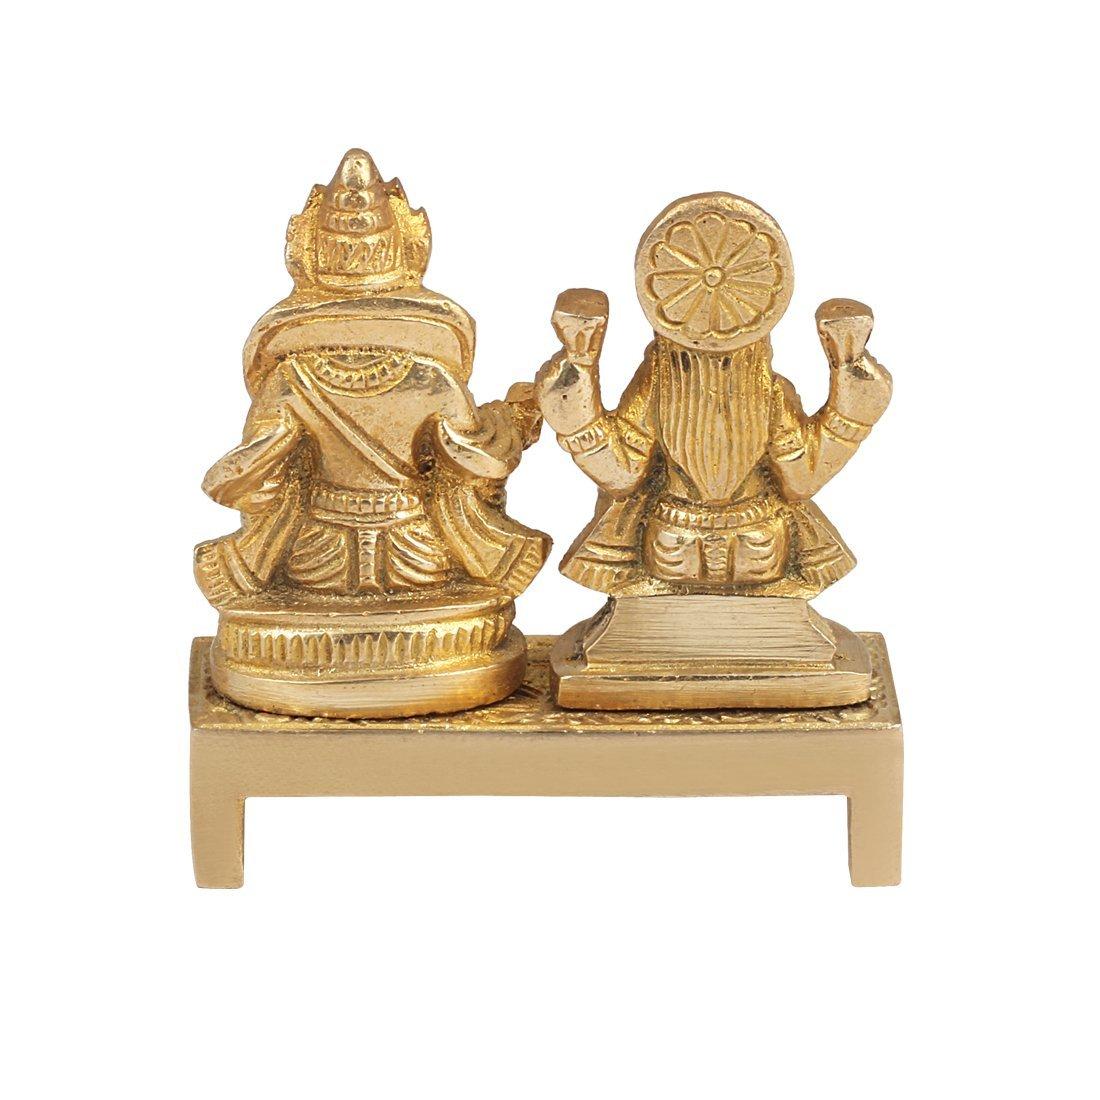 3c378f3c6afa Onvay laxmi kuber Idol   hindu god laxmi kuber statue idol murti ( 7 x 6.5  ) cm   Idols Gifts   Laxmi Kuber Murti   Laxmi Kuber   Diwali Gift ...